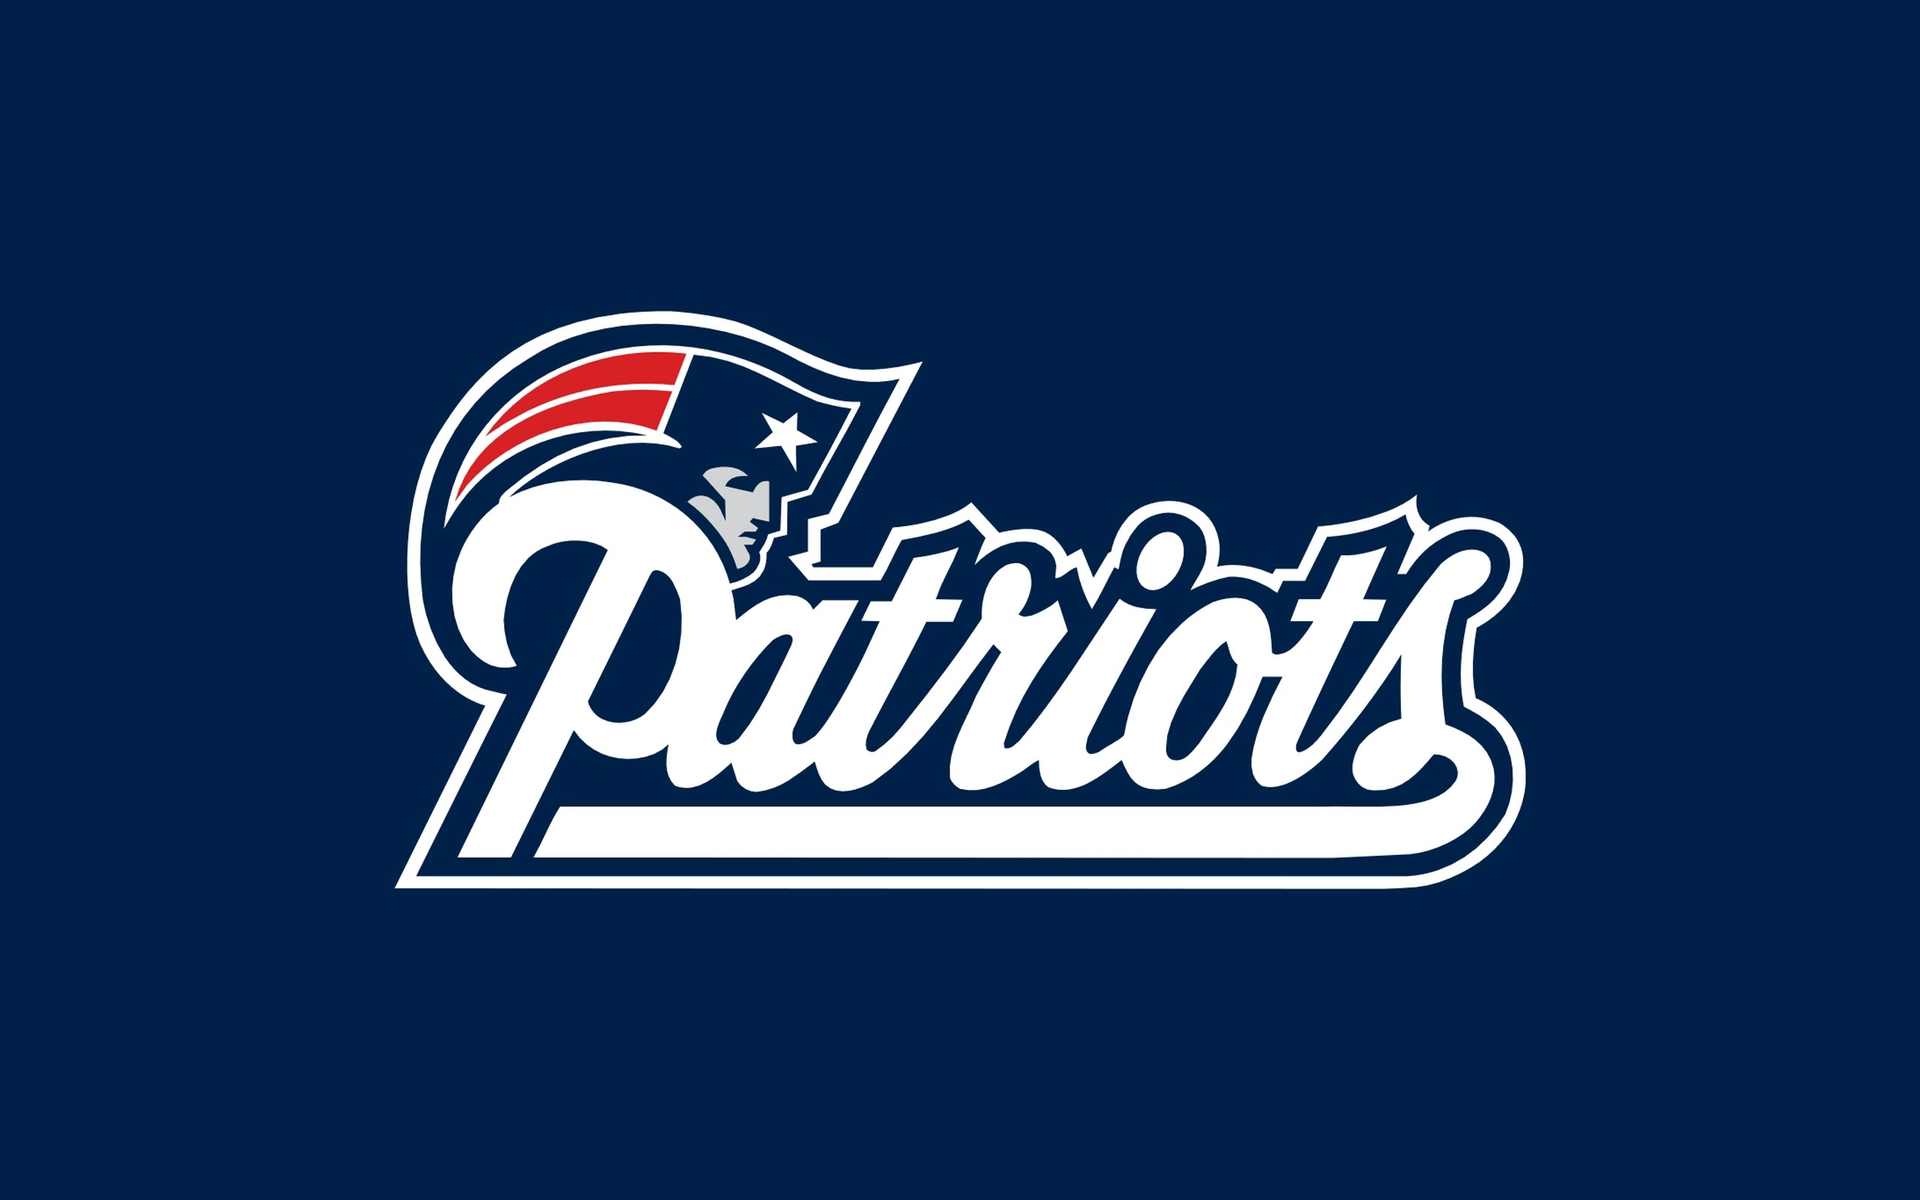 New England Patriots Football 2015 Background Wallpaper Sport 95624 1920x1200